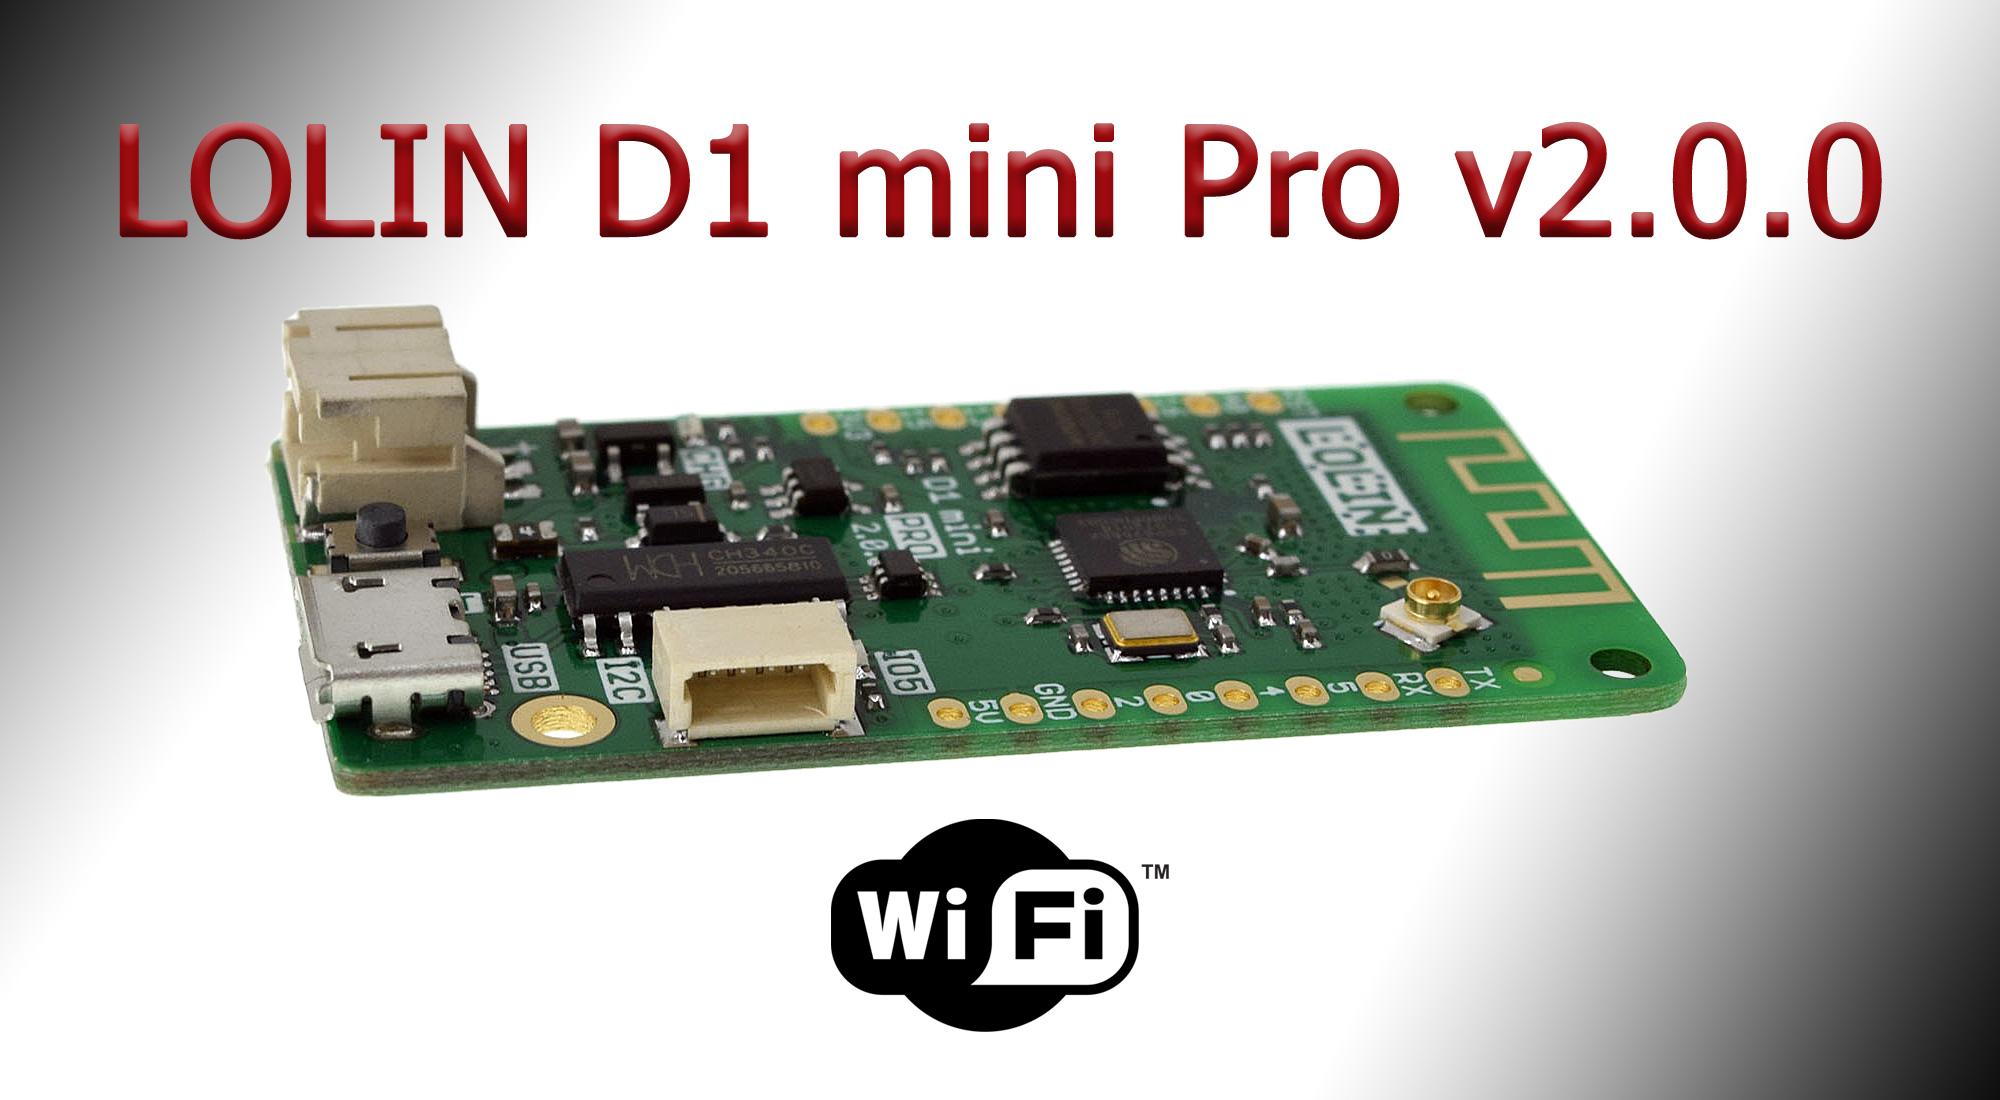 LOLIN D1 mini Pro v2.0.0 od WEMOS Electronics